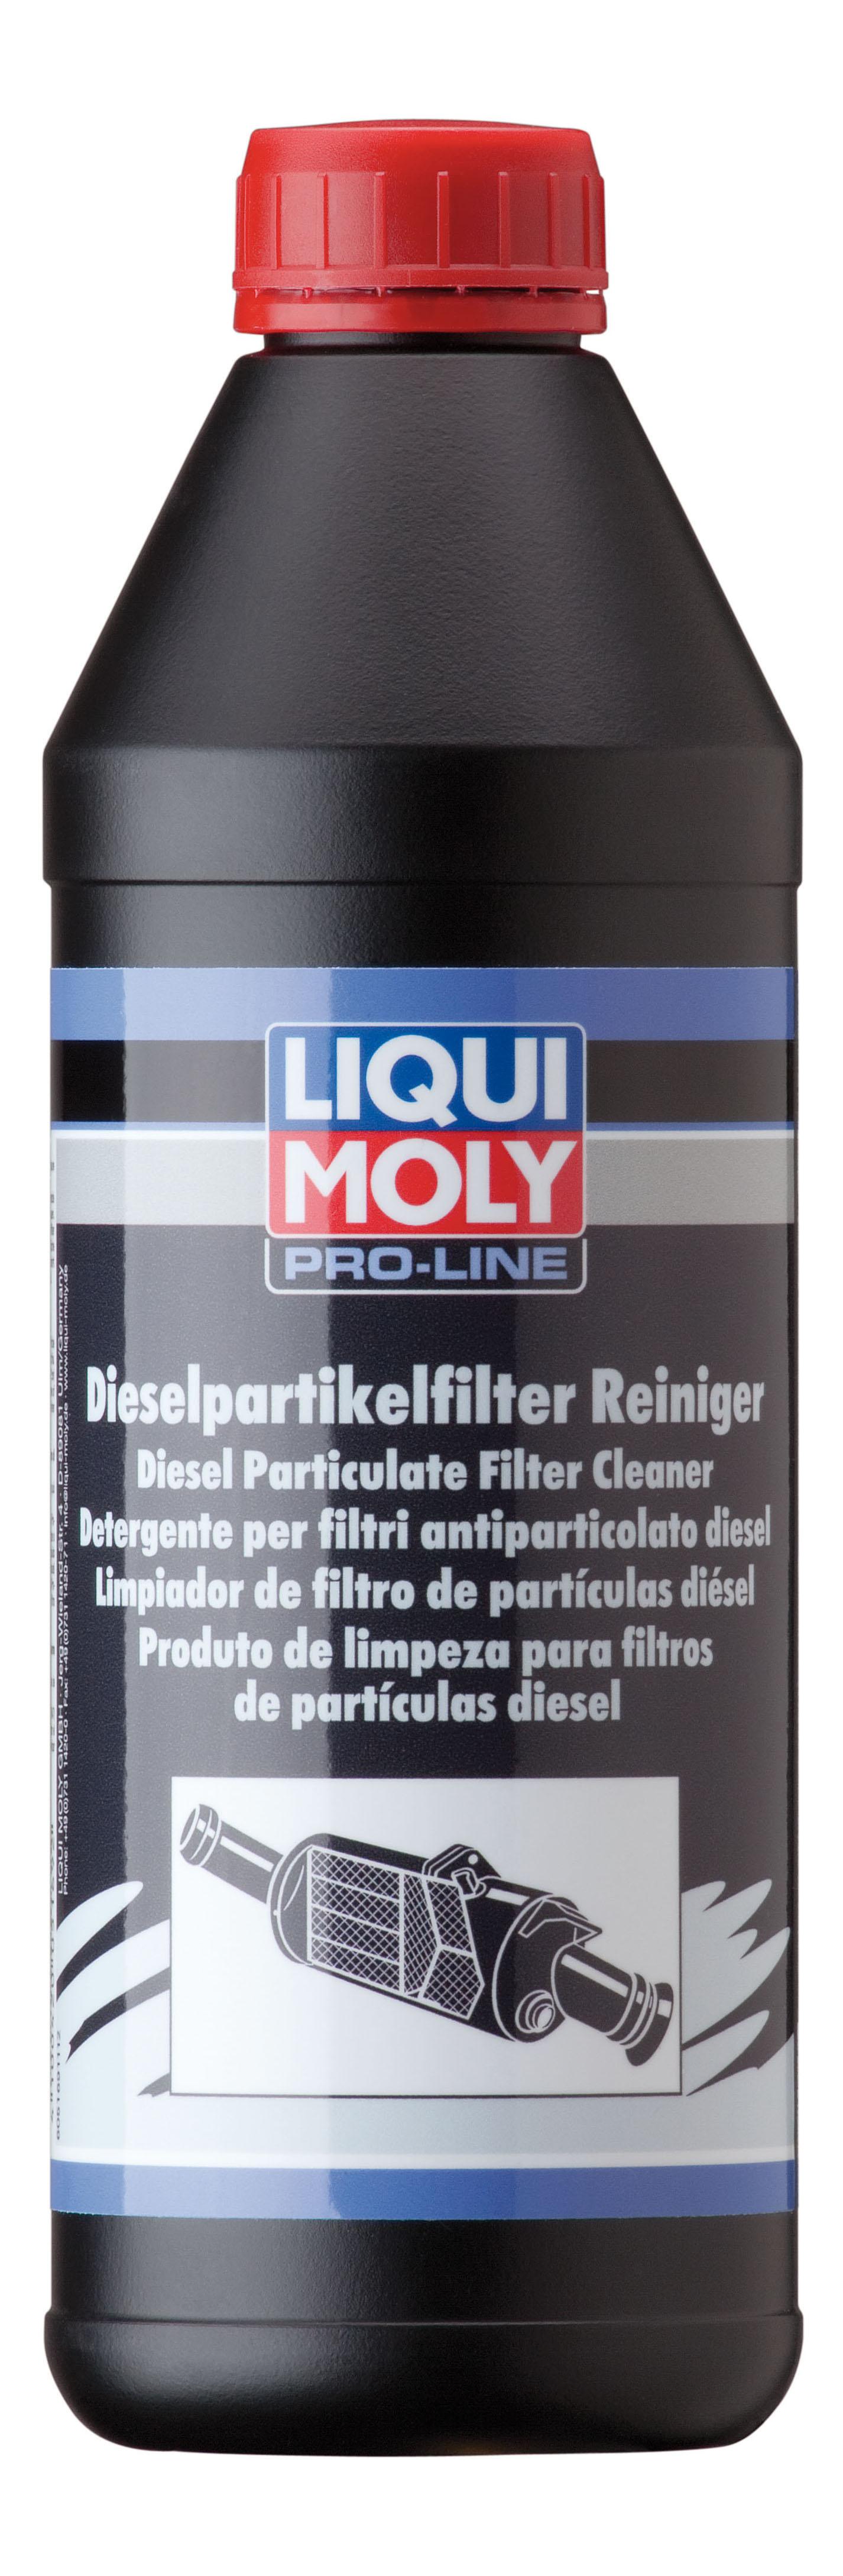 LIQUI MOLY PRO-LINE DIESEL PARTIKELFILTER REINIGER